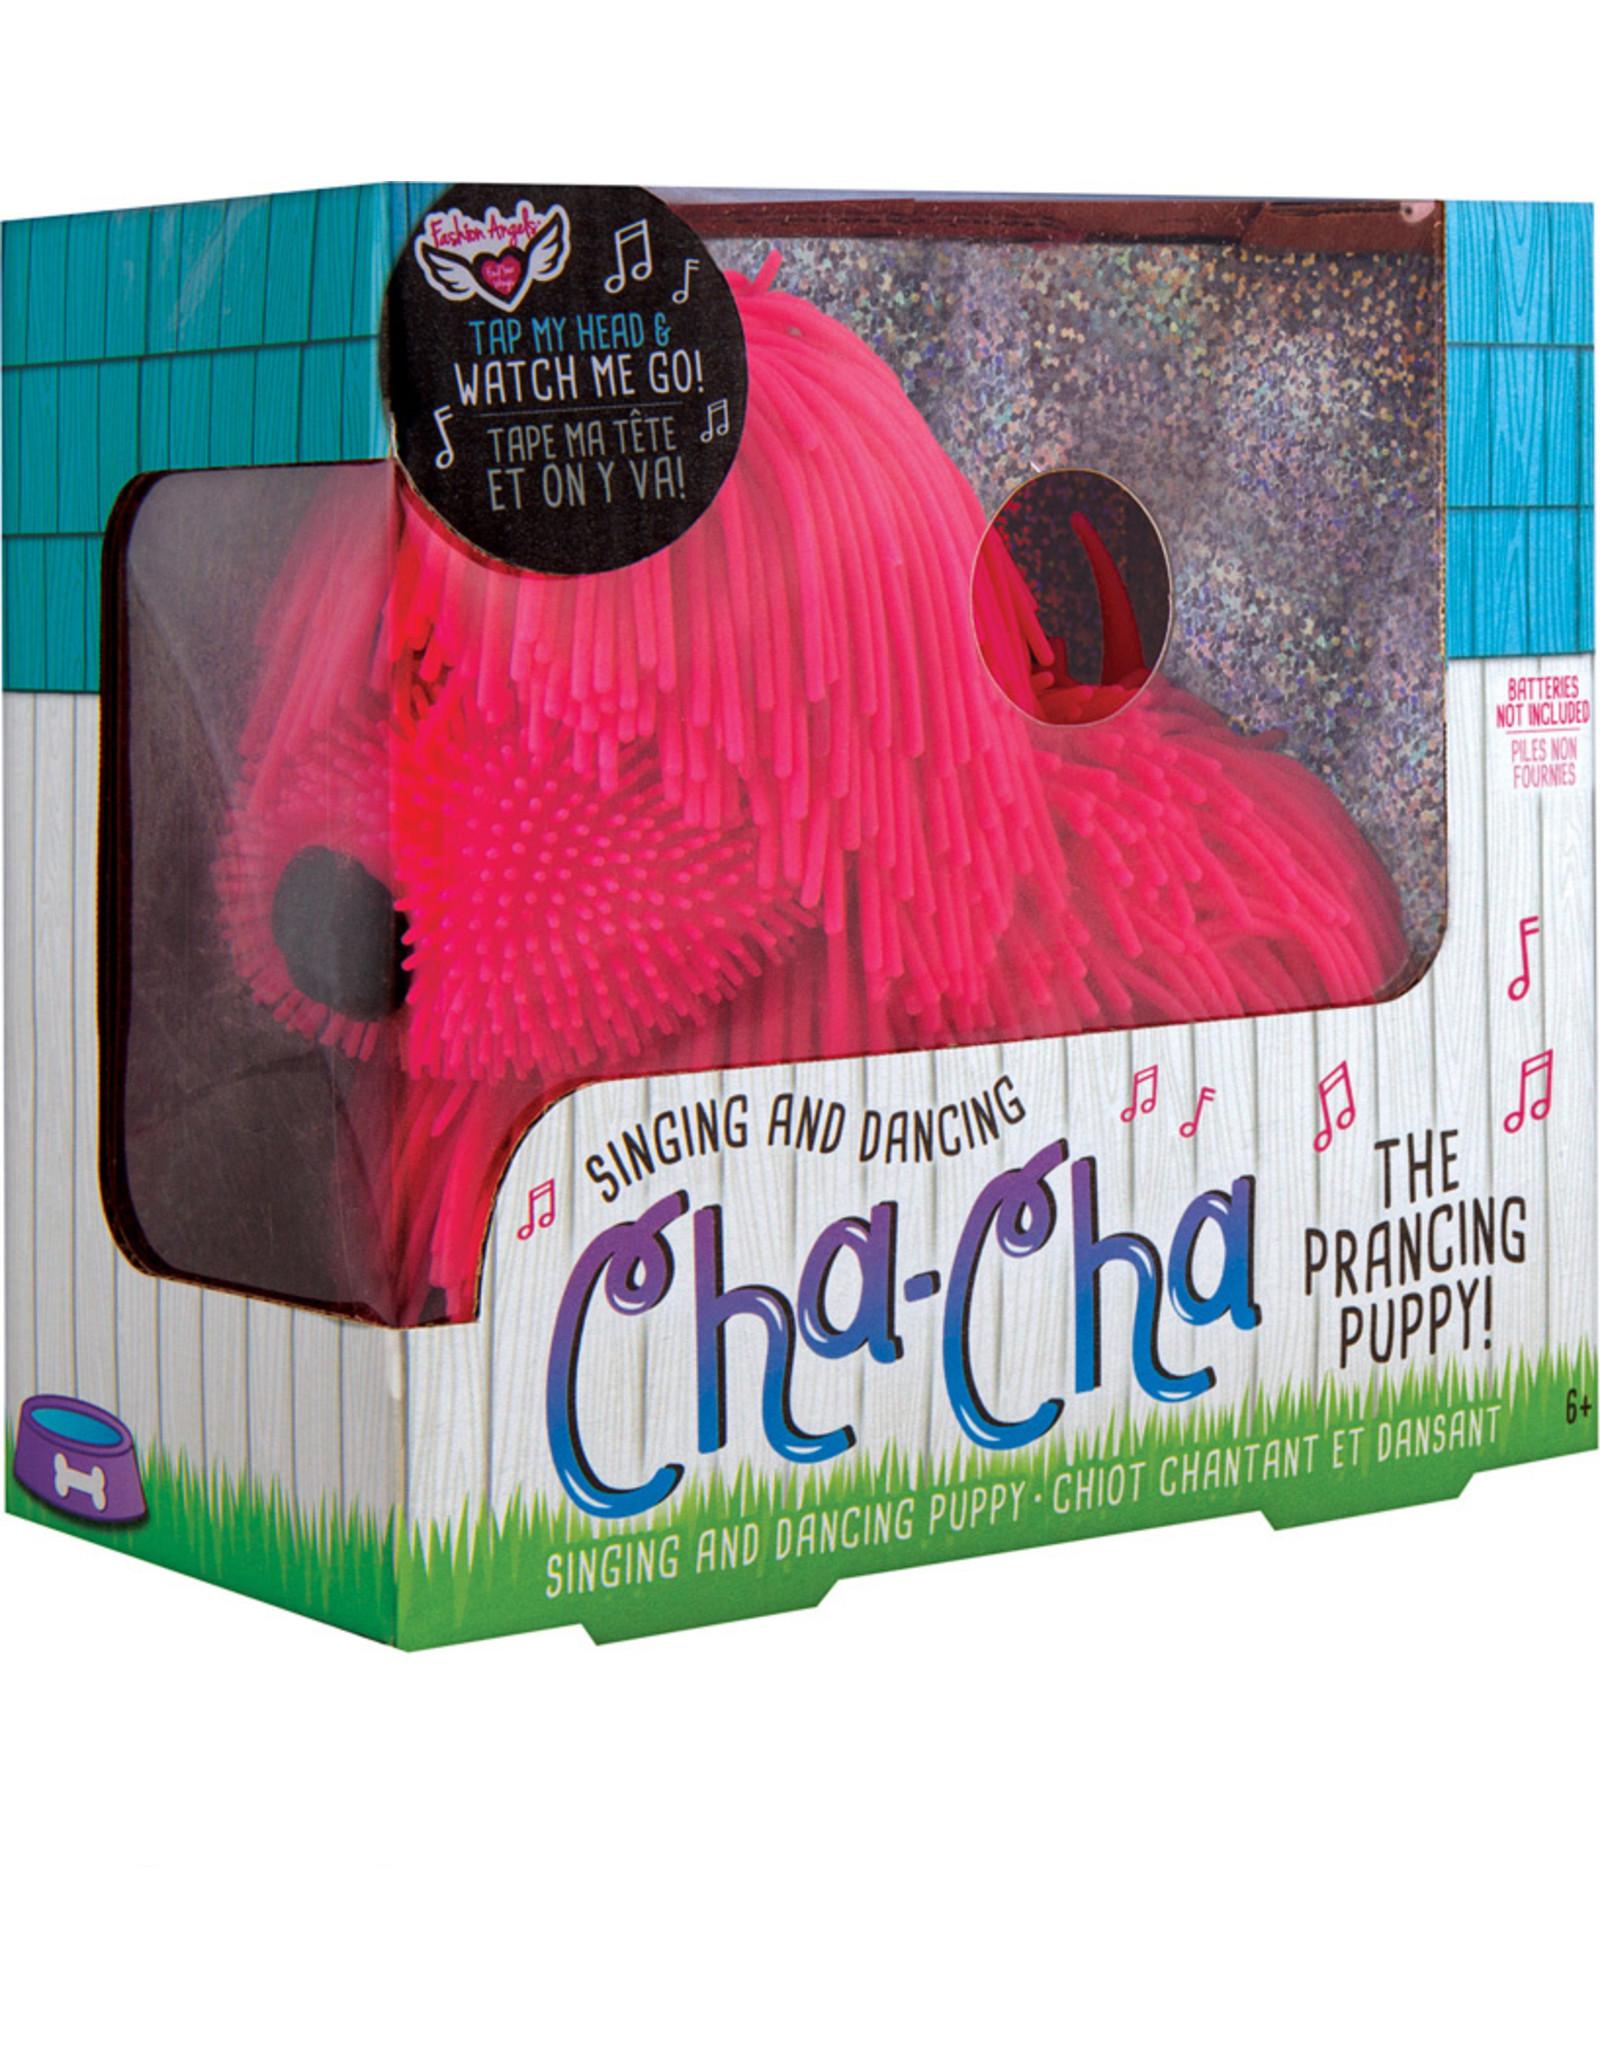 Fashion Angels Enterprises Cha Cha The Prancing Pup - Pink